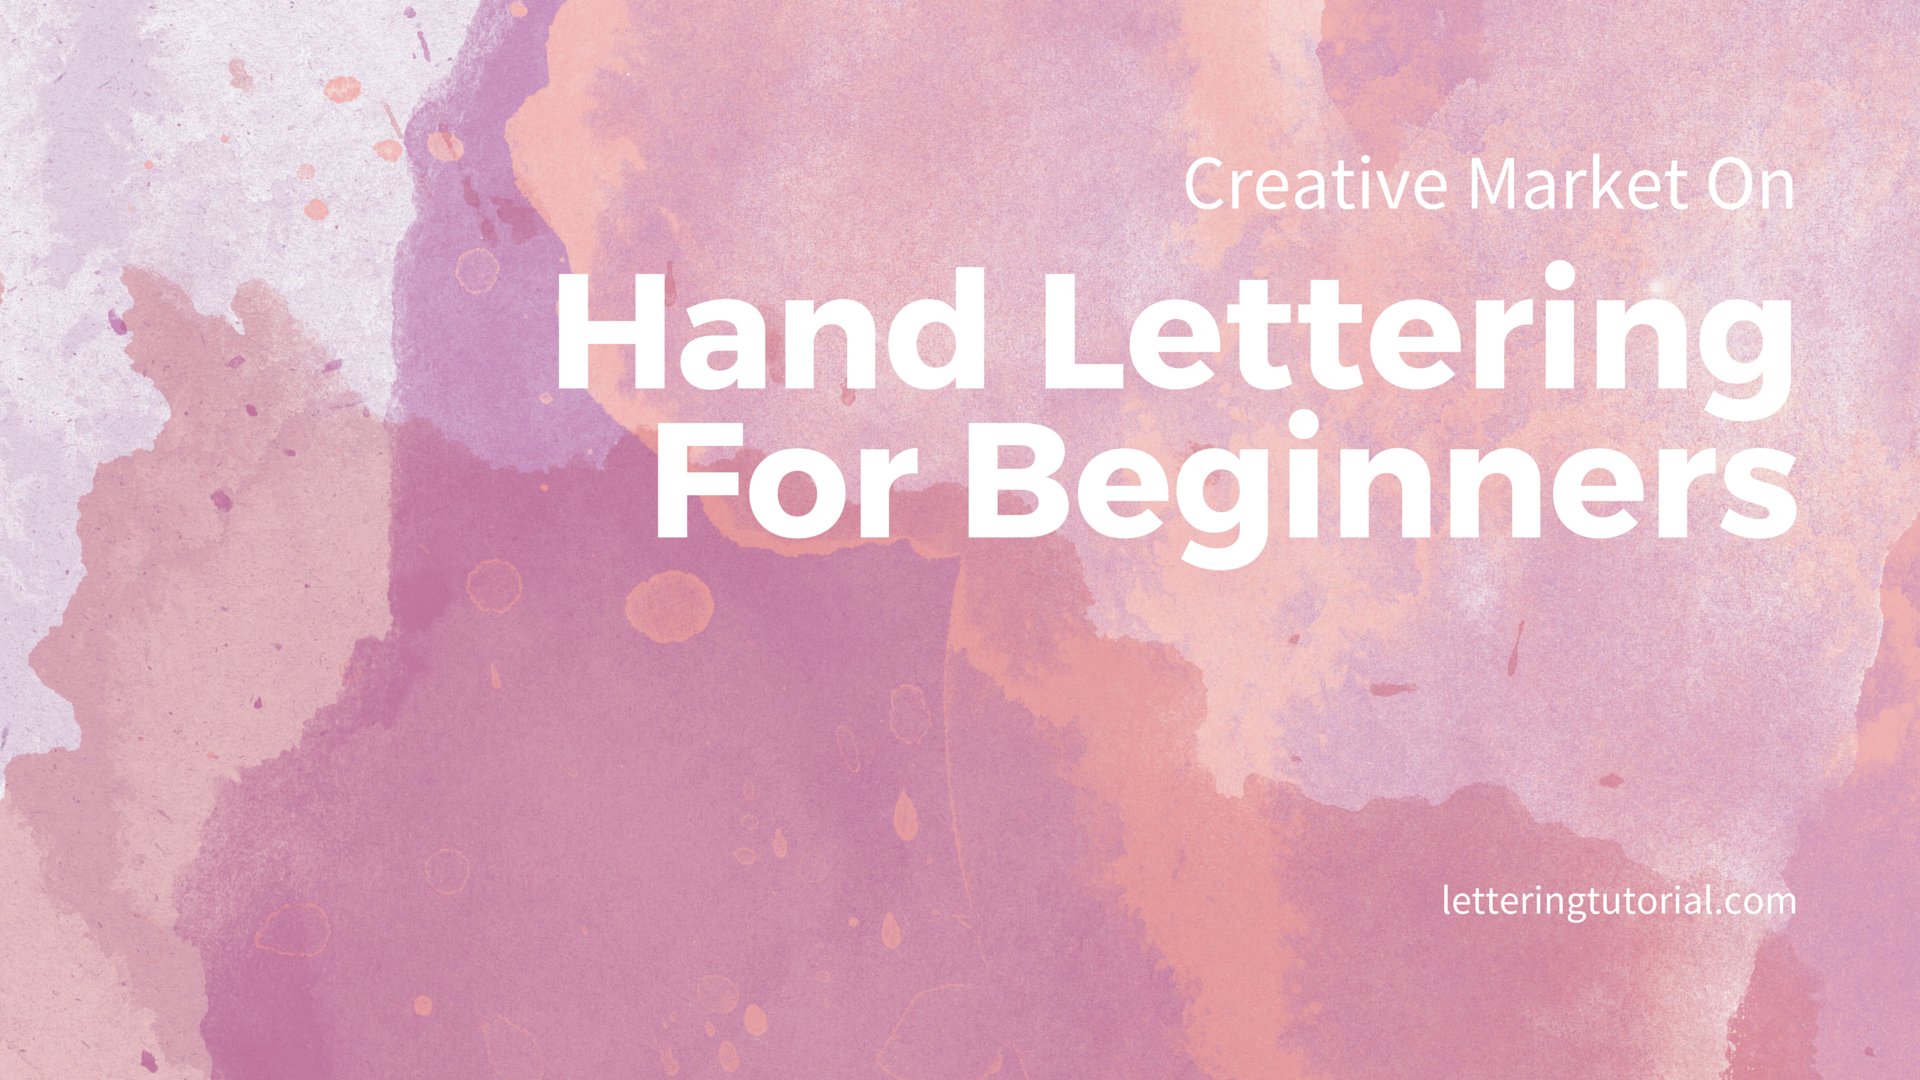 Creative Market On Hand Lettering For Beginners - Lettering Tutorial